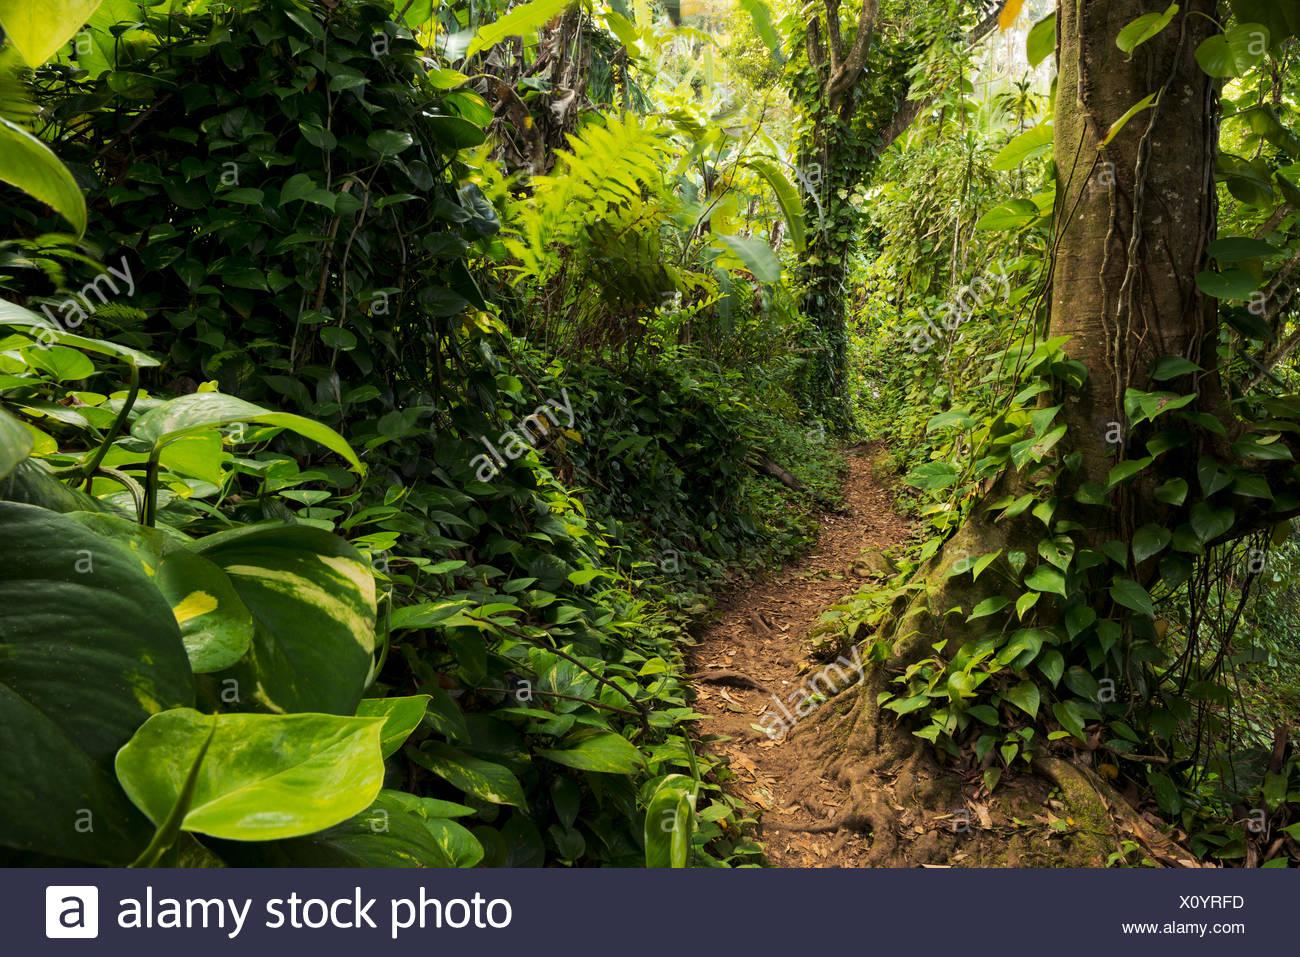 The Caribbean, Guadeloupe, island, jungle, rainforest, dreamlike, path, way, plants, leaves, tree, green, lush, lianas, vegetation, mystical, scenery, - Stock Image